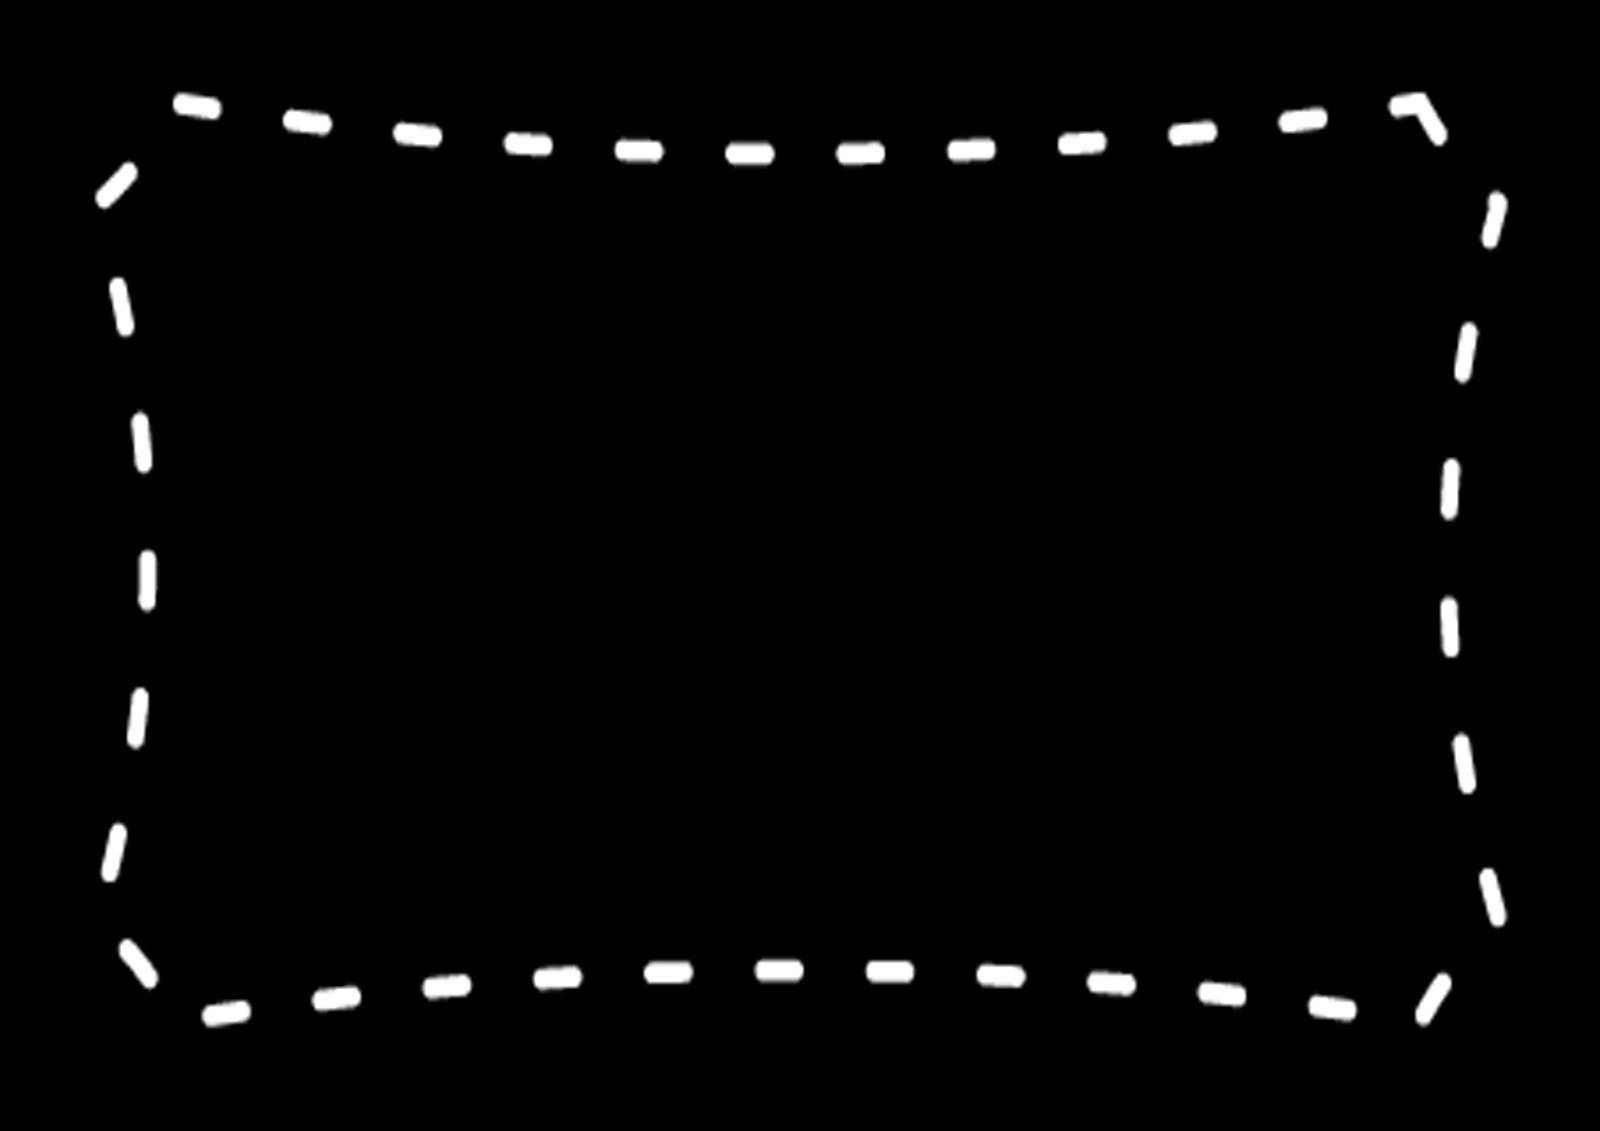 Chalkboard frame png. Etiquetas en blanco y